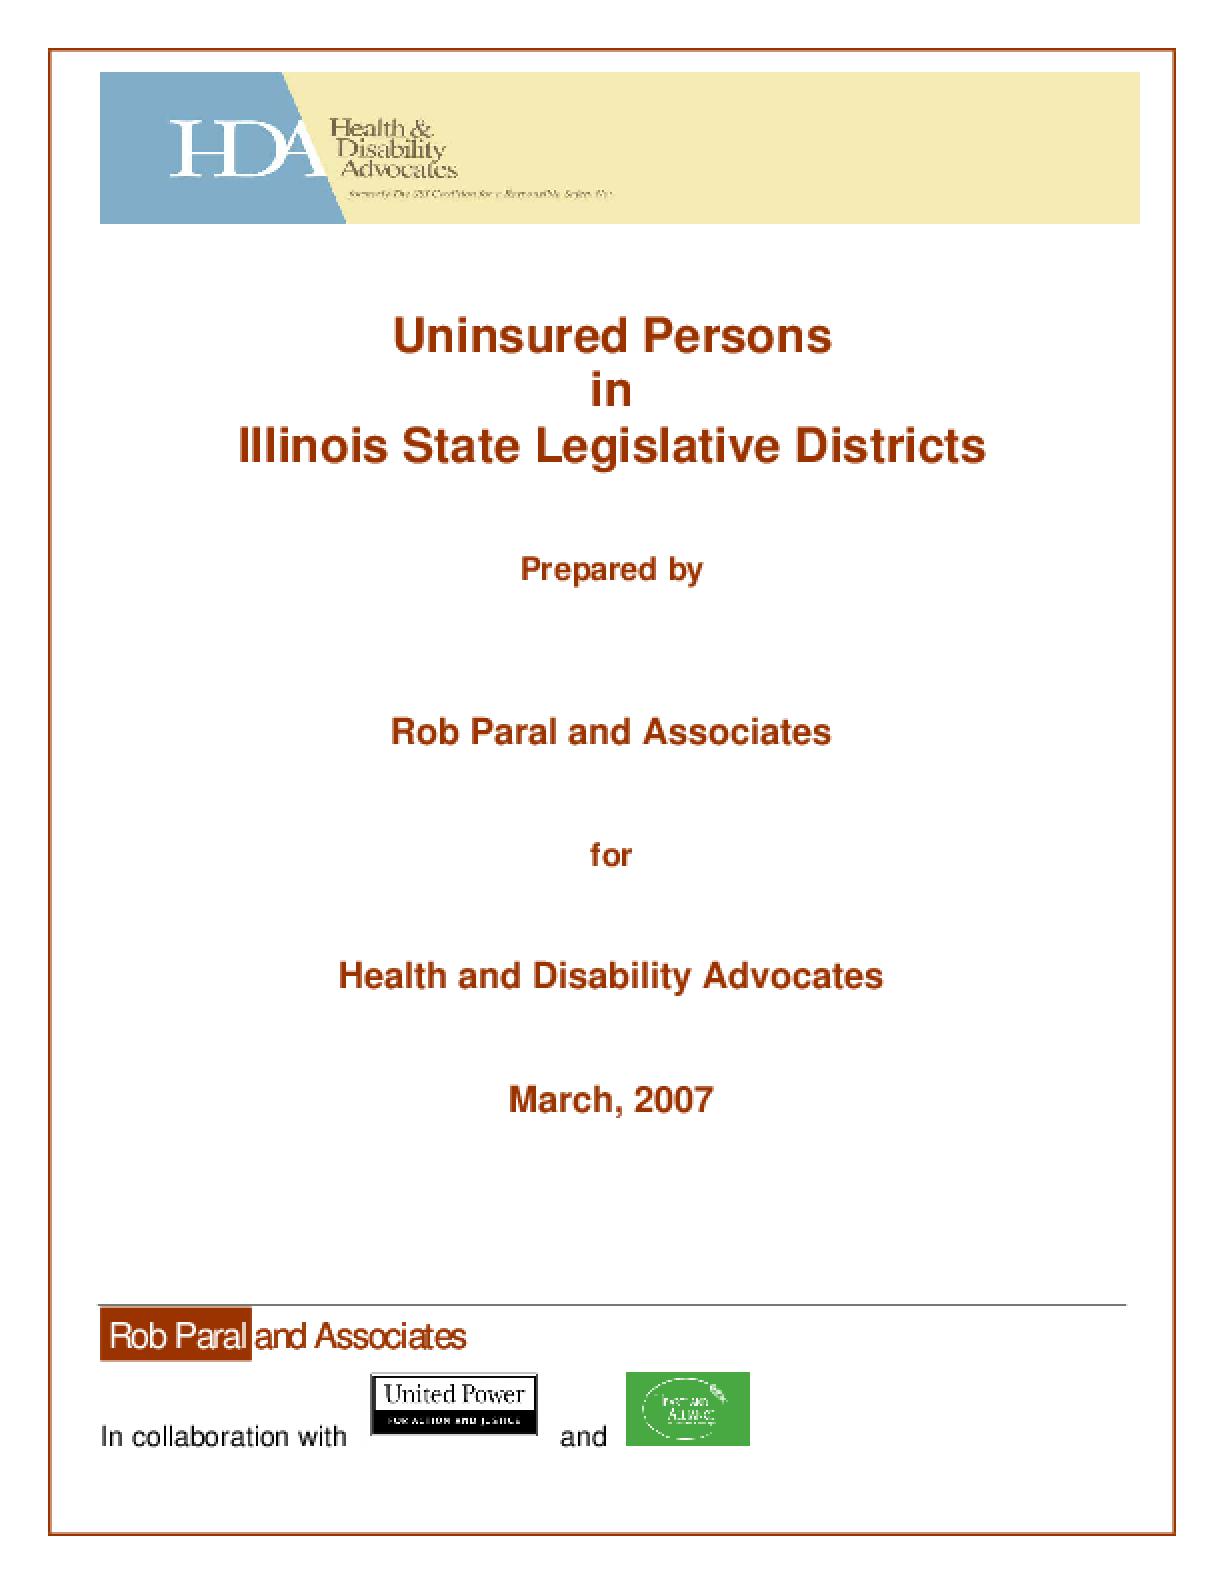 Uninsured Persons in Illinois Legislative Districts